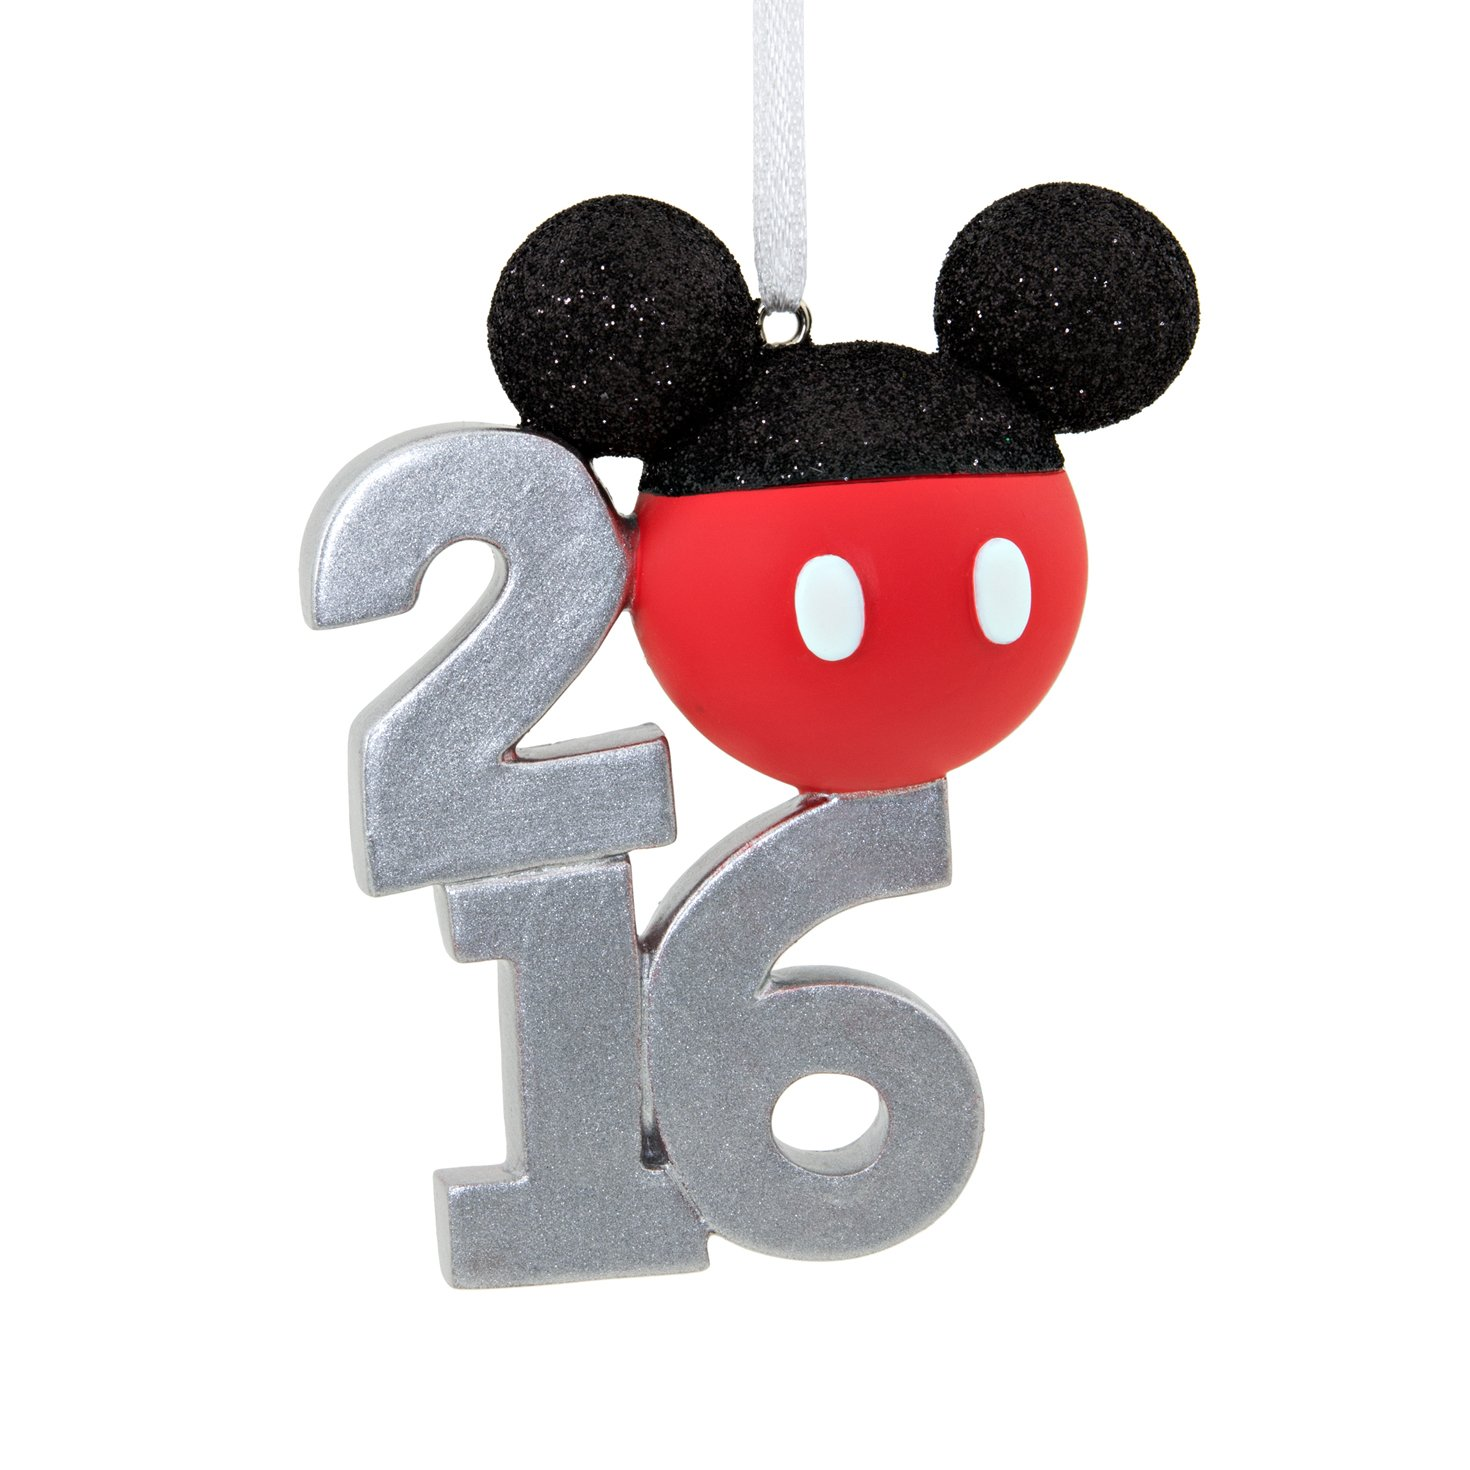 Amazon: Hallmark 2016 Disney Mickey Mouse Holiday Ornament: Home &  Kitchen